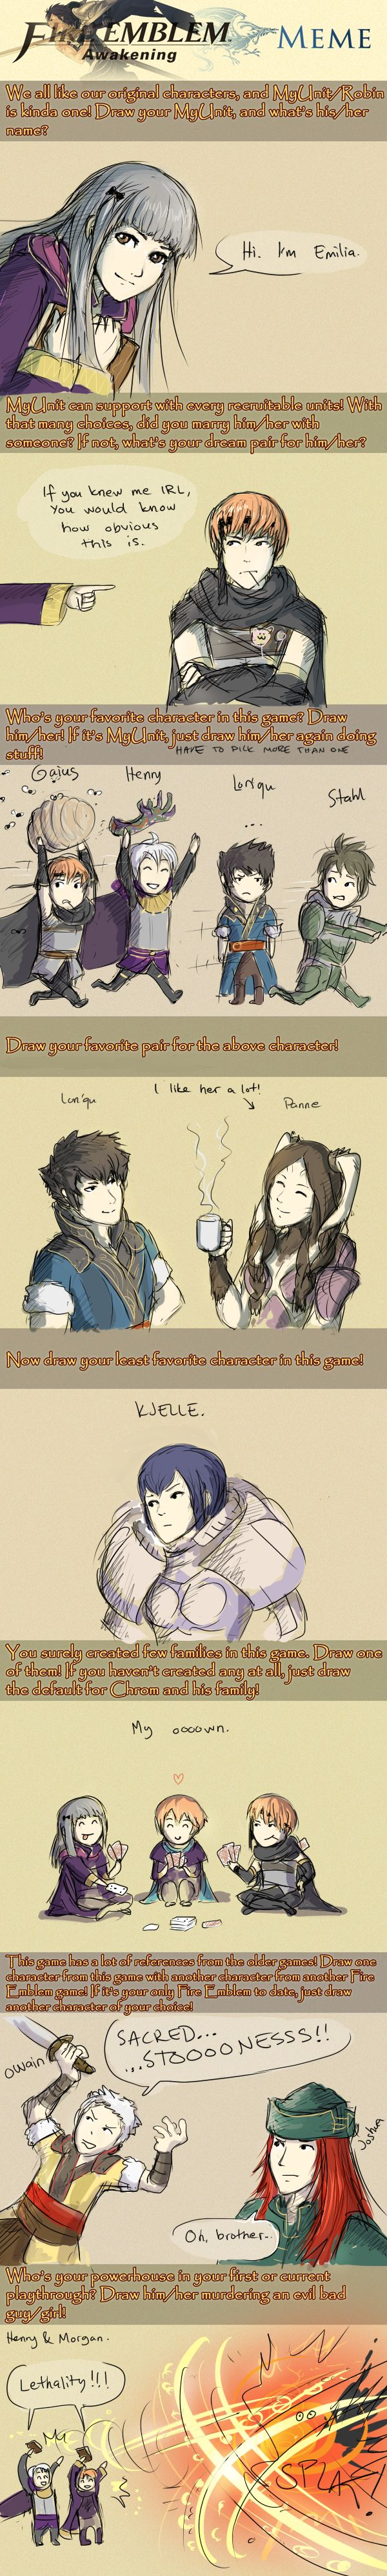 Fire Emblem Awakening Meme (Emilia's version) by Oviot.deviantart.com on @DeviantArt I love Emilia's scrbbles they are just too great... (Plus we both married Gaius....)